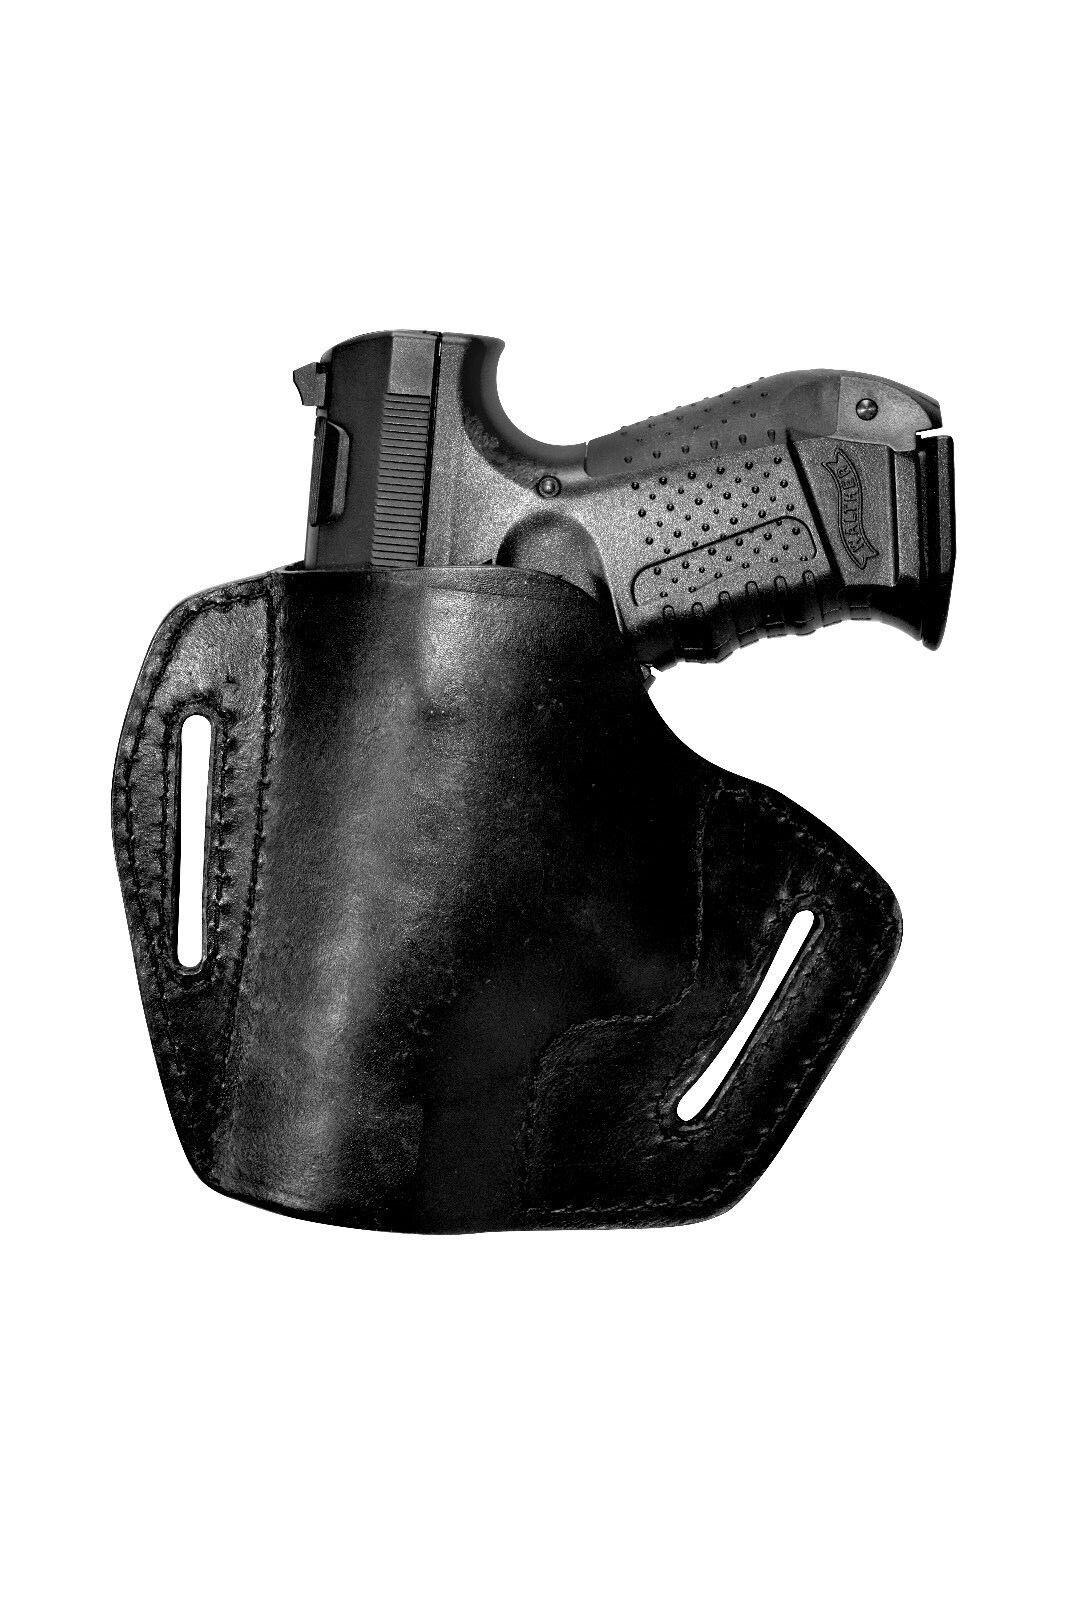 UX Pistolenholster Leder Holster für brauning GPDA 9 Waffenholster Waffenholster Waffenholster schwarz NEU 7201ec